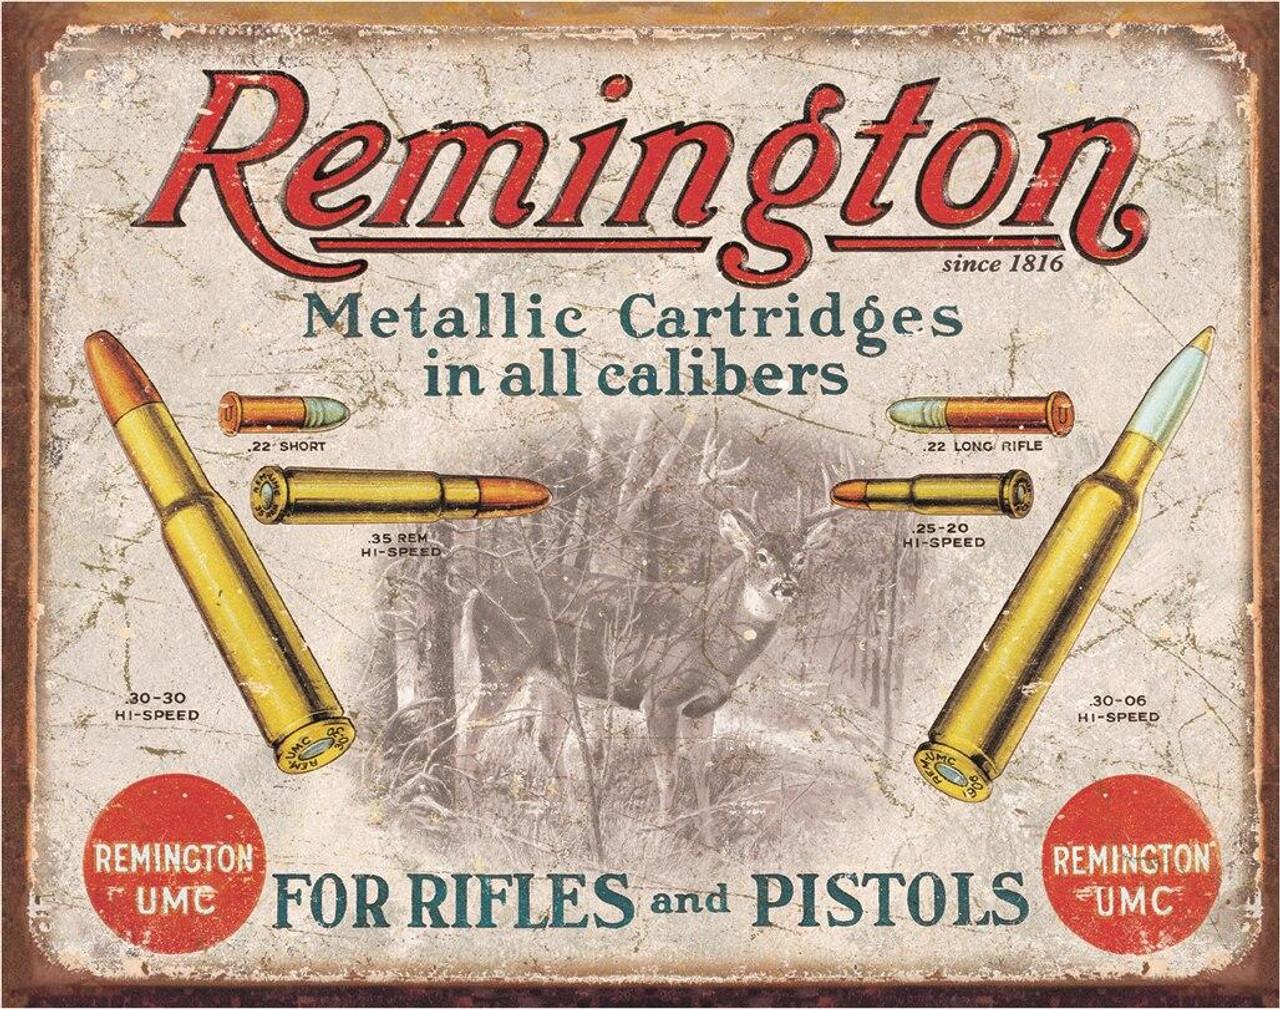 Remington REM - For Rifles and Pistols